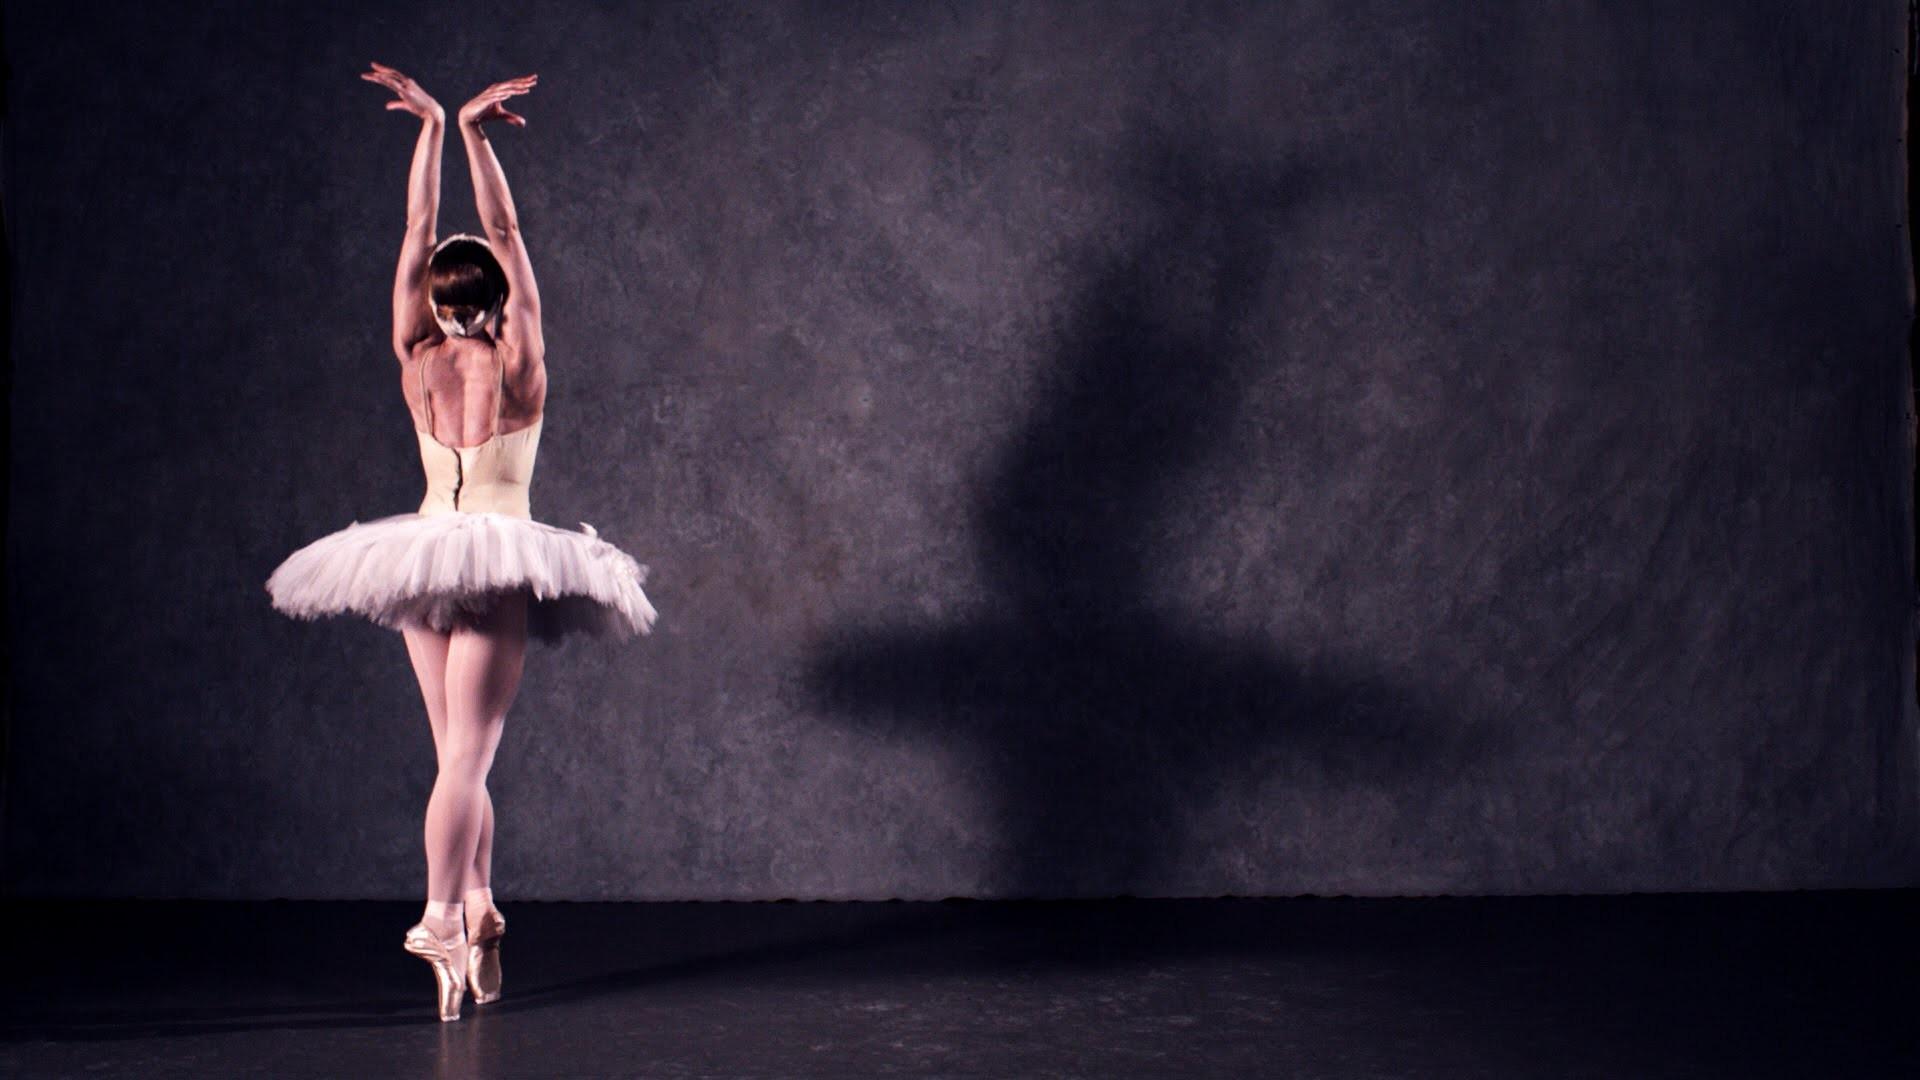 Ballet-Dance-with-HD-Desktop-1920x1080-px-KB-wallpaper-wp3602942